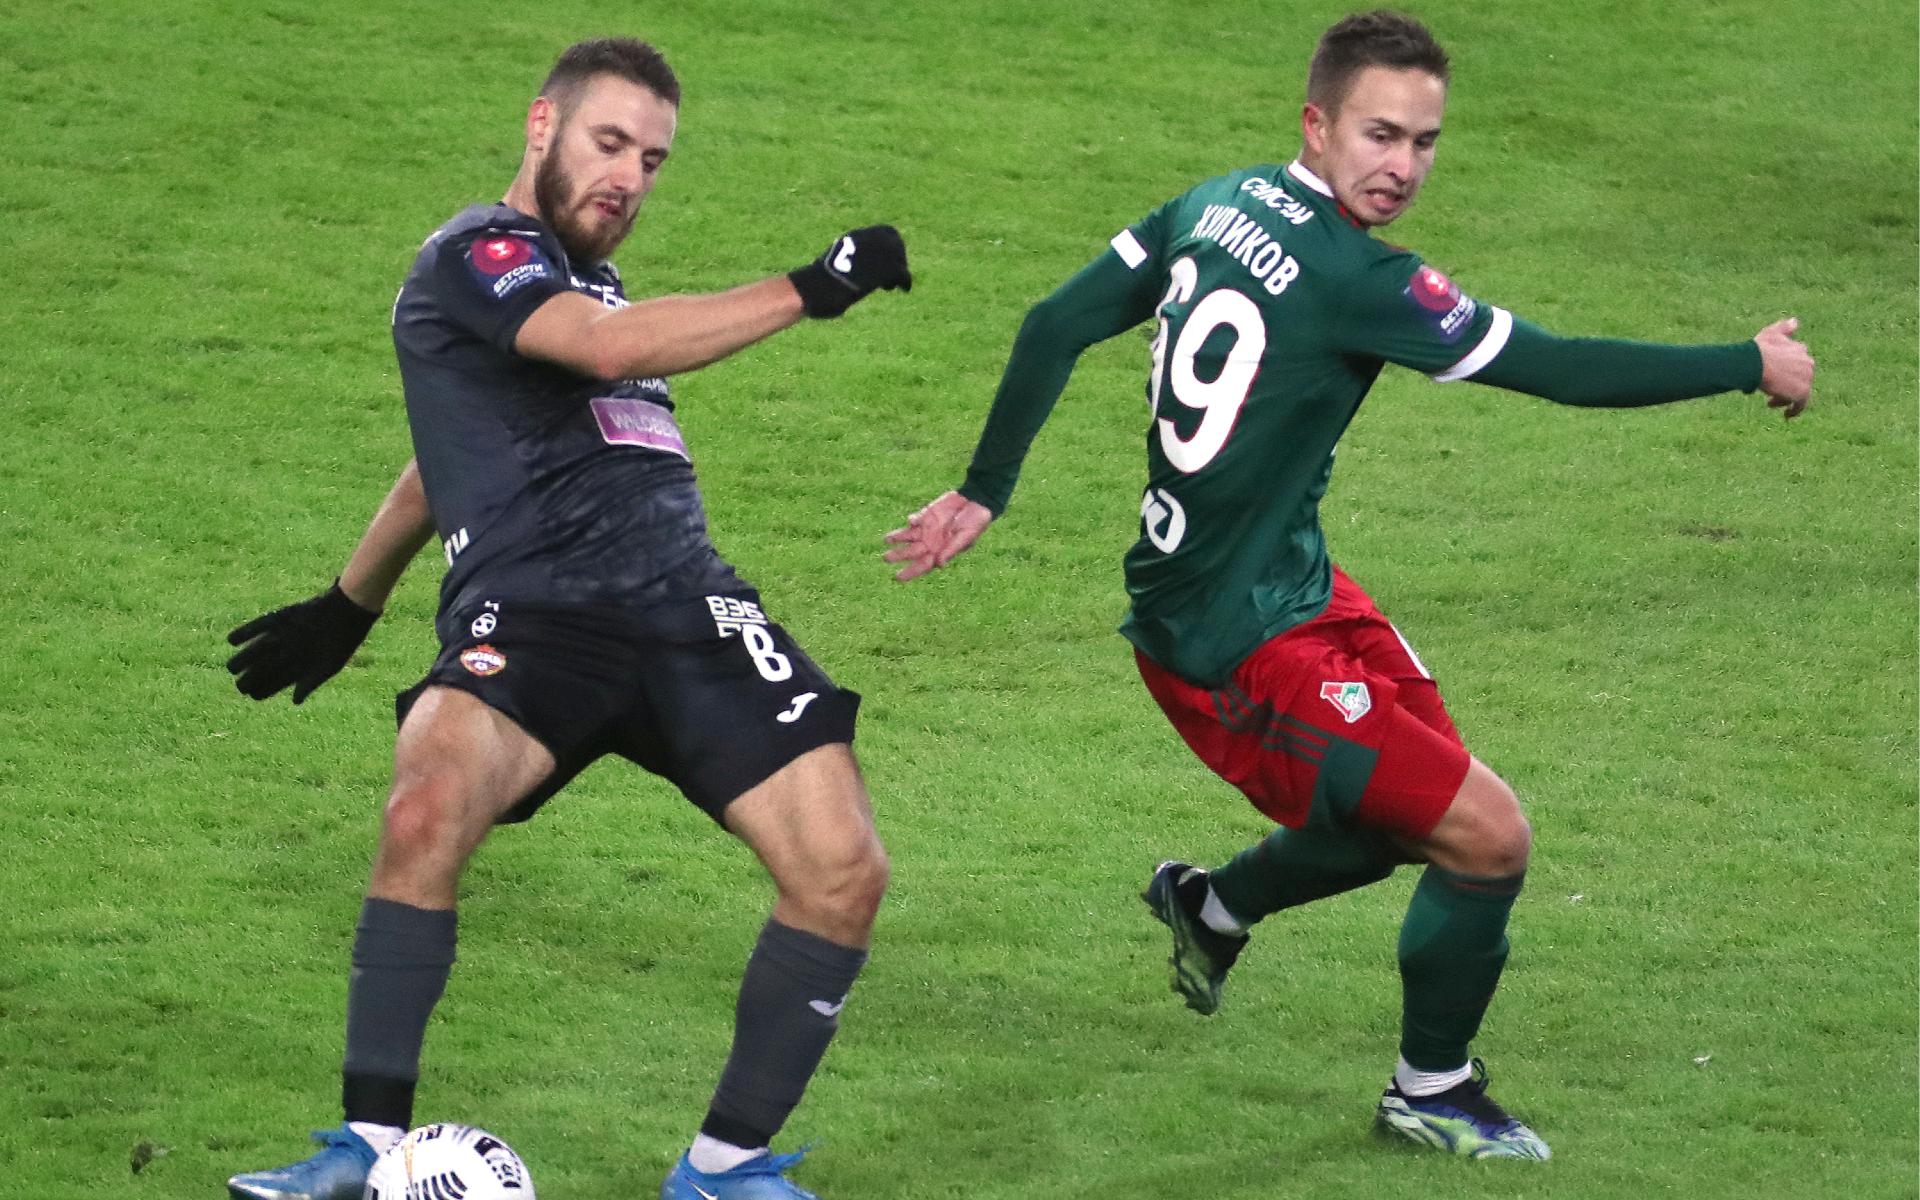 Фото:Никола Влашич (слева, Сергей Фадеичев/ТАСС)